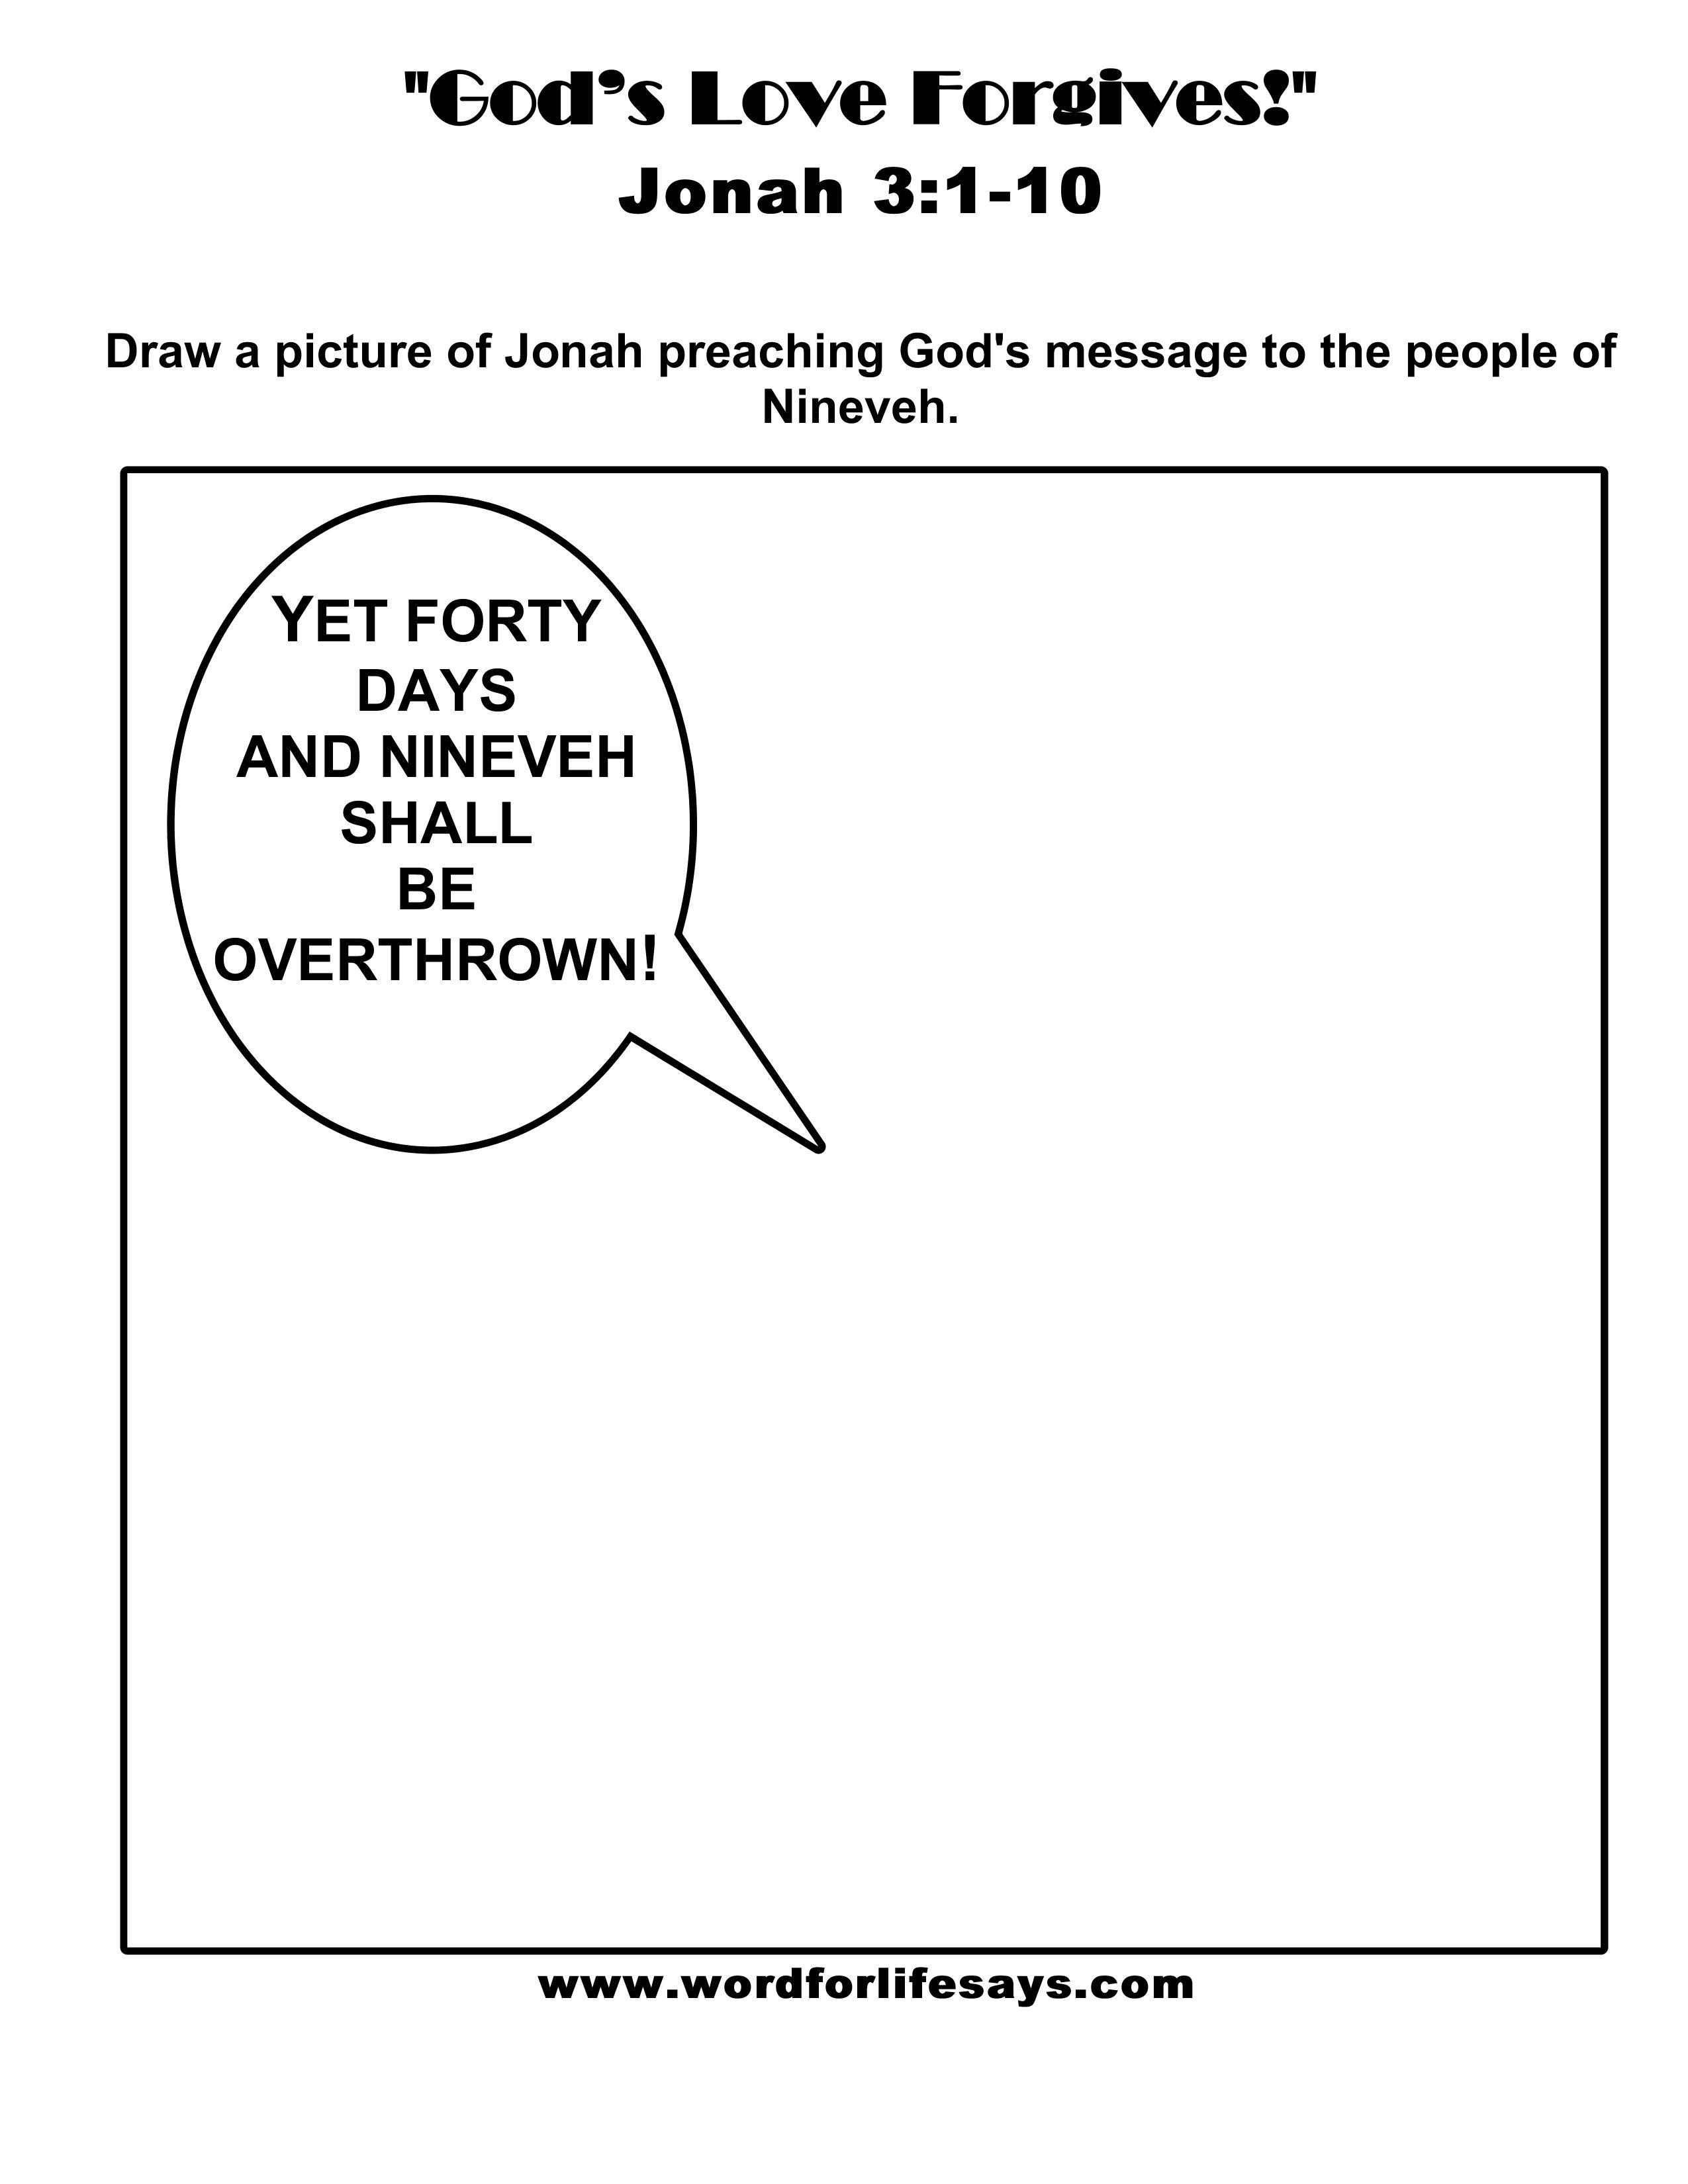 god u0027s love forgives u201d sunday lesson summary for jonah 3 1